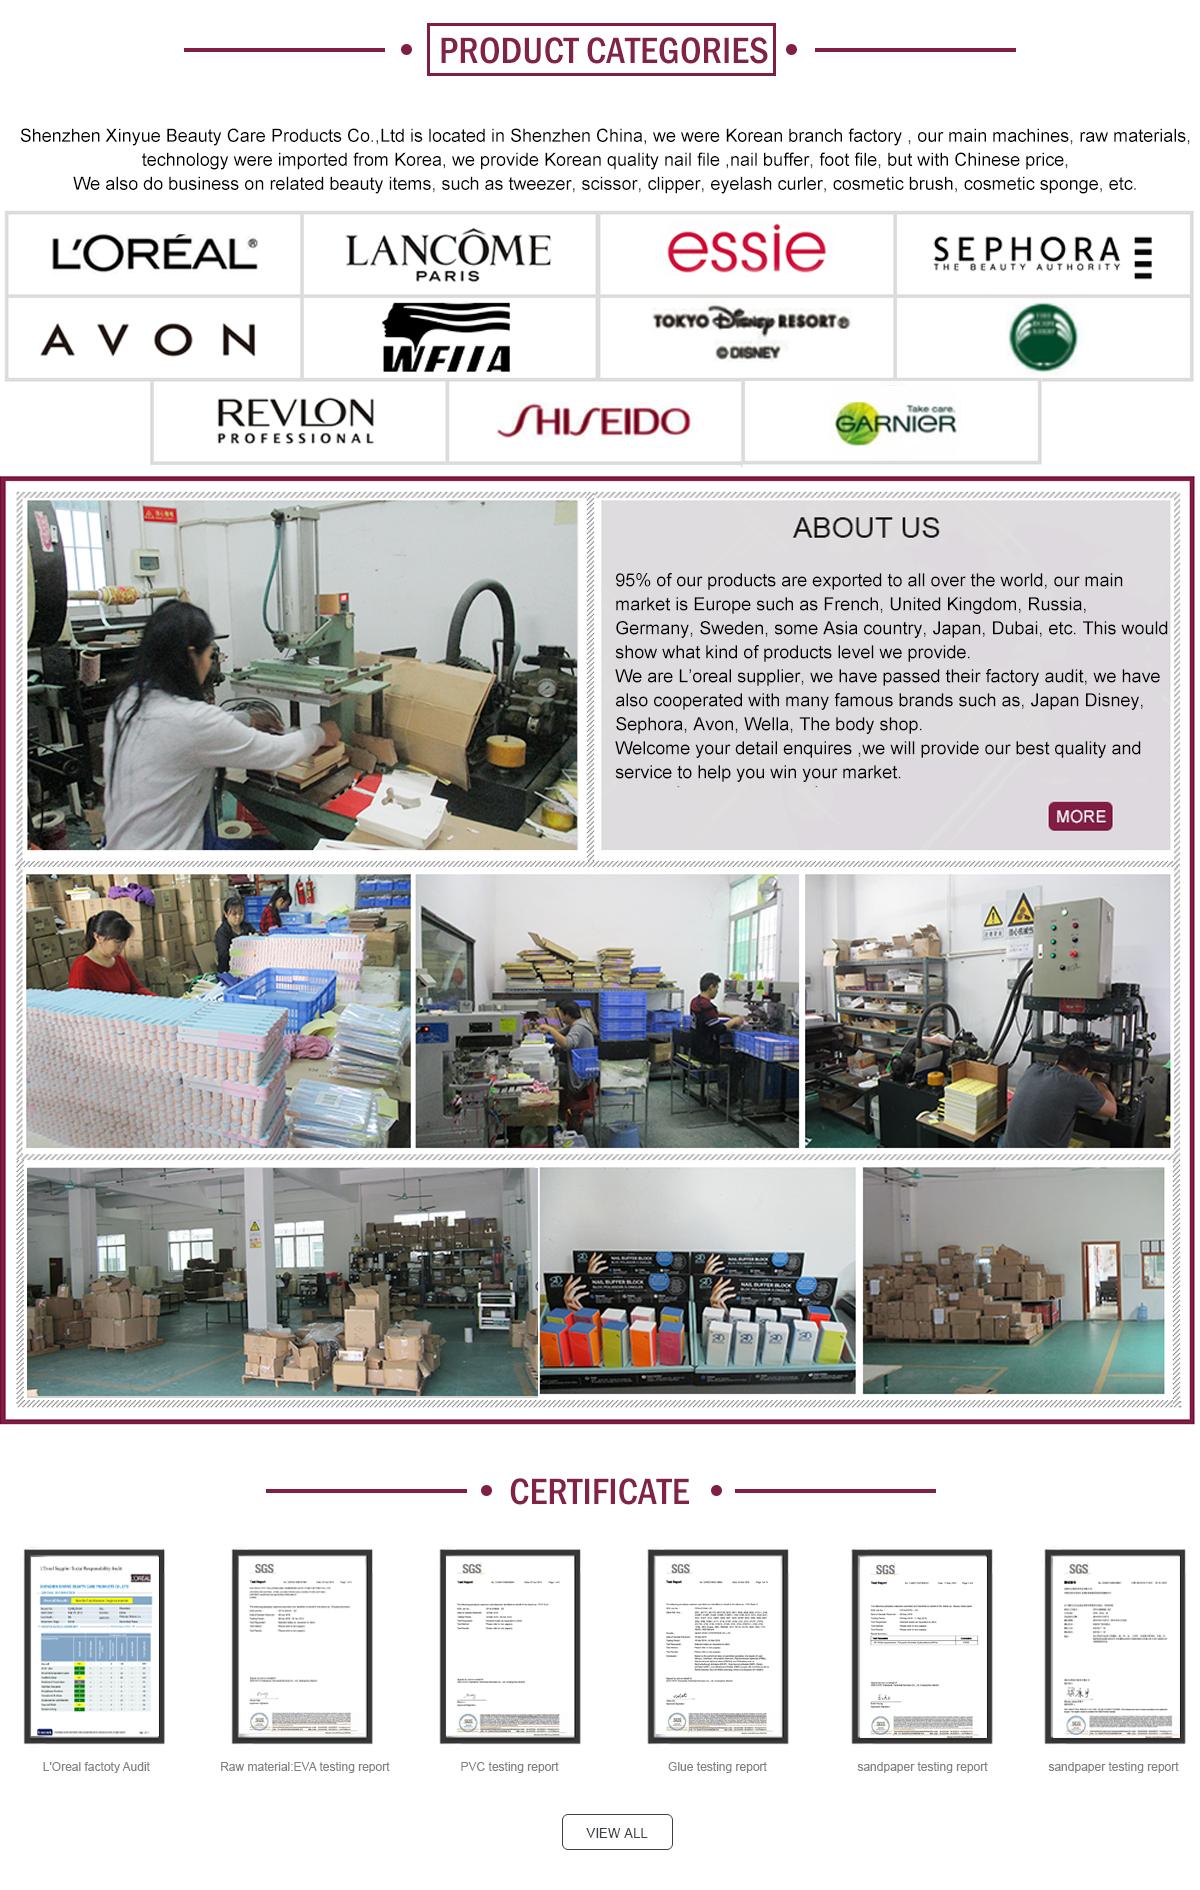 Shenzhen Xinyue Beauty Care Products Co., Ltd. - nail files, nail buffer